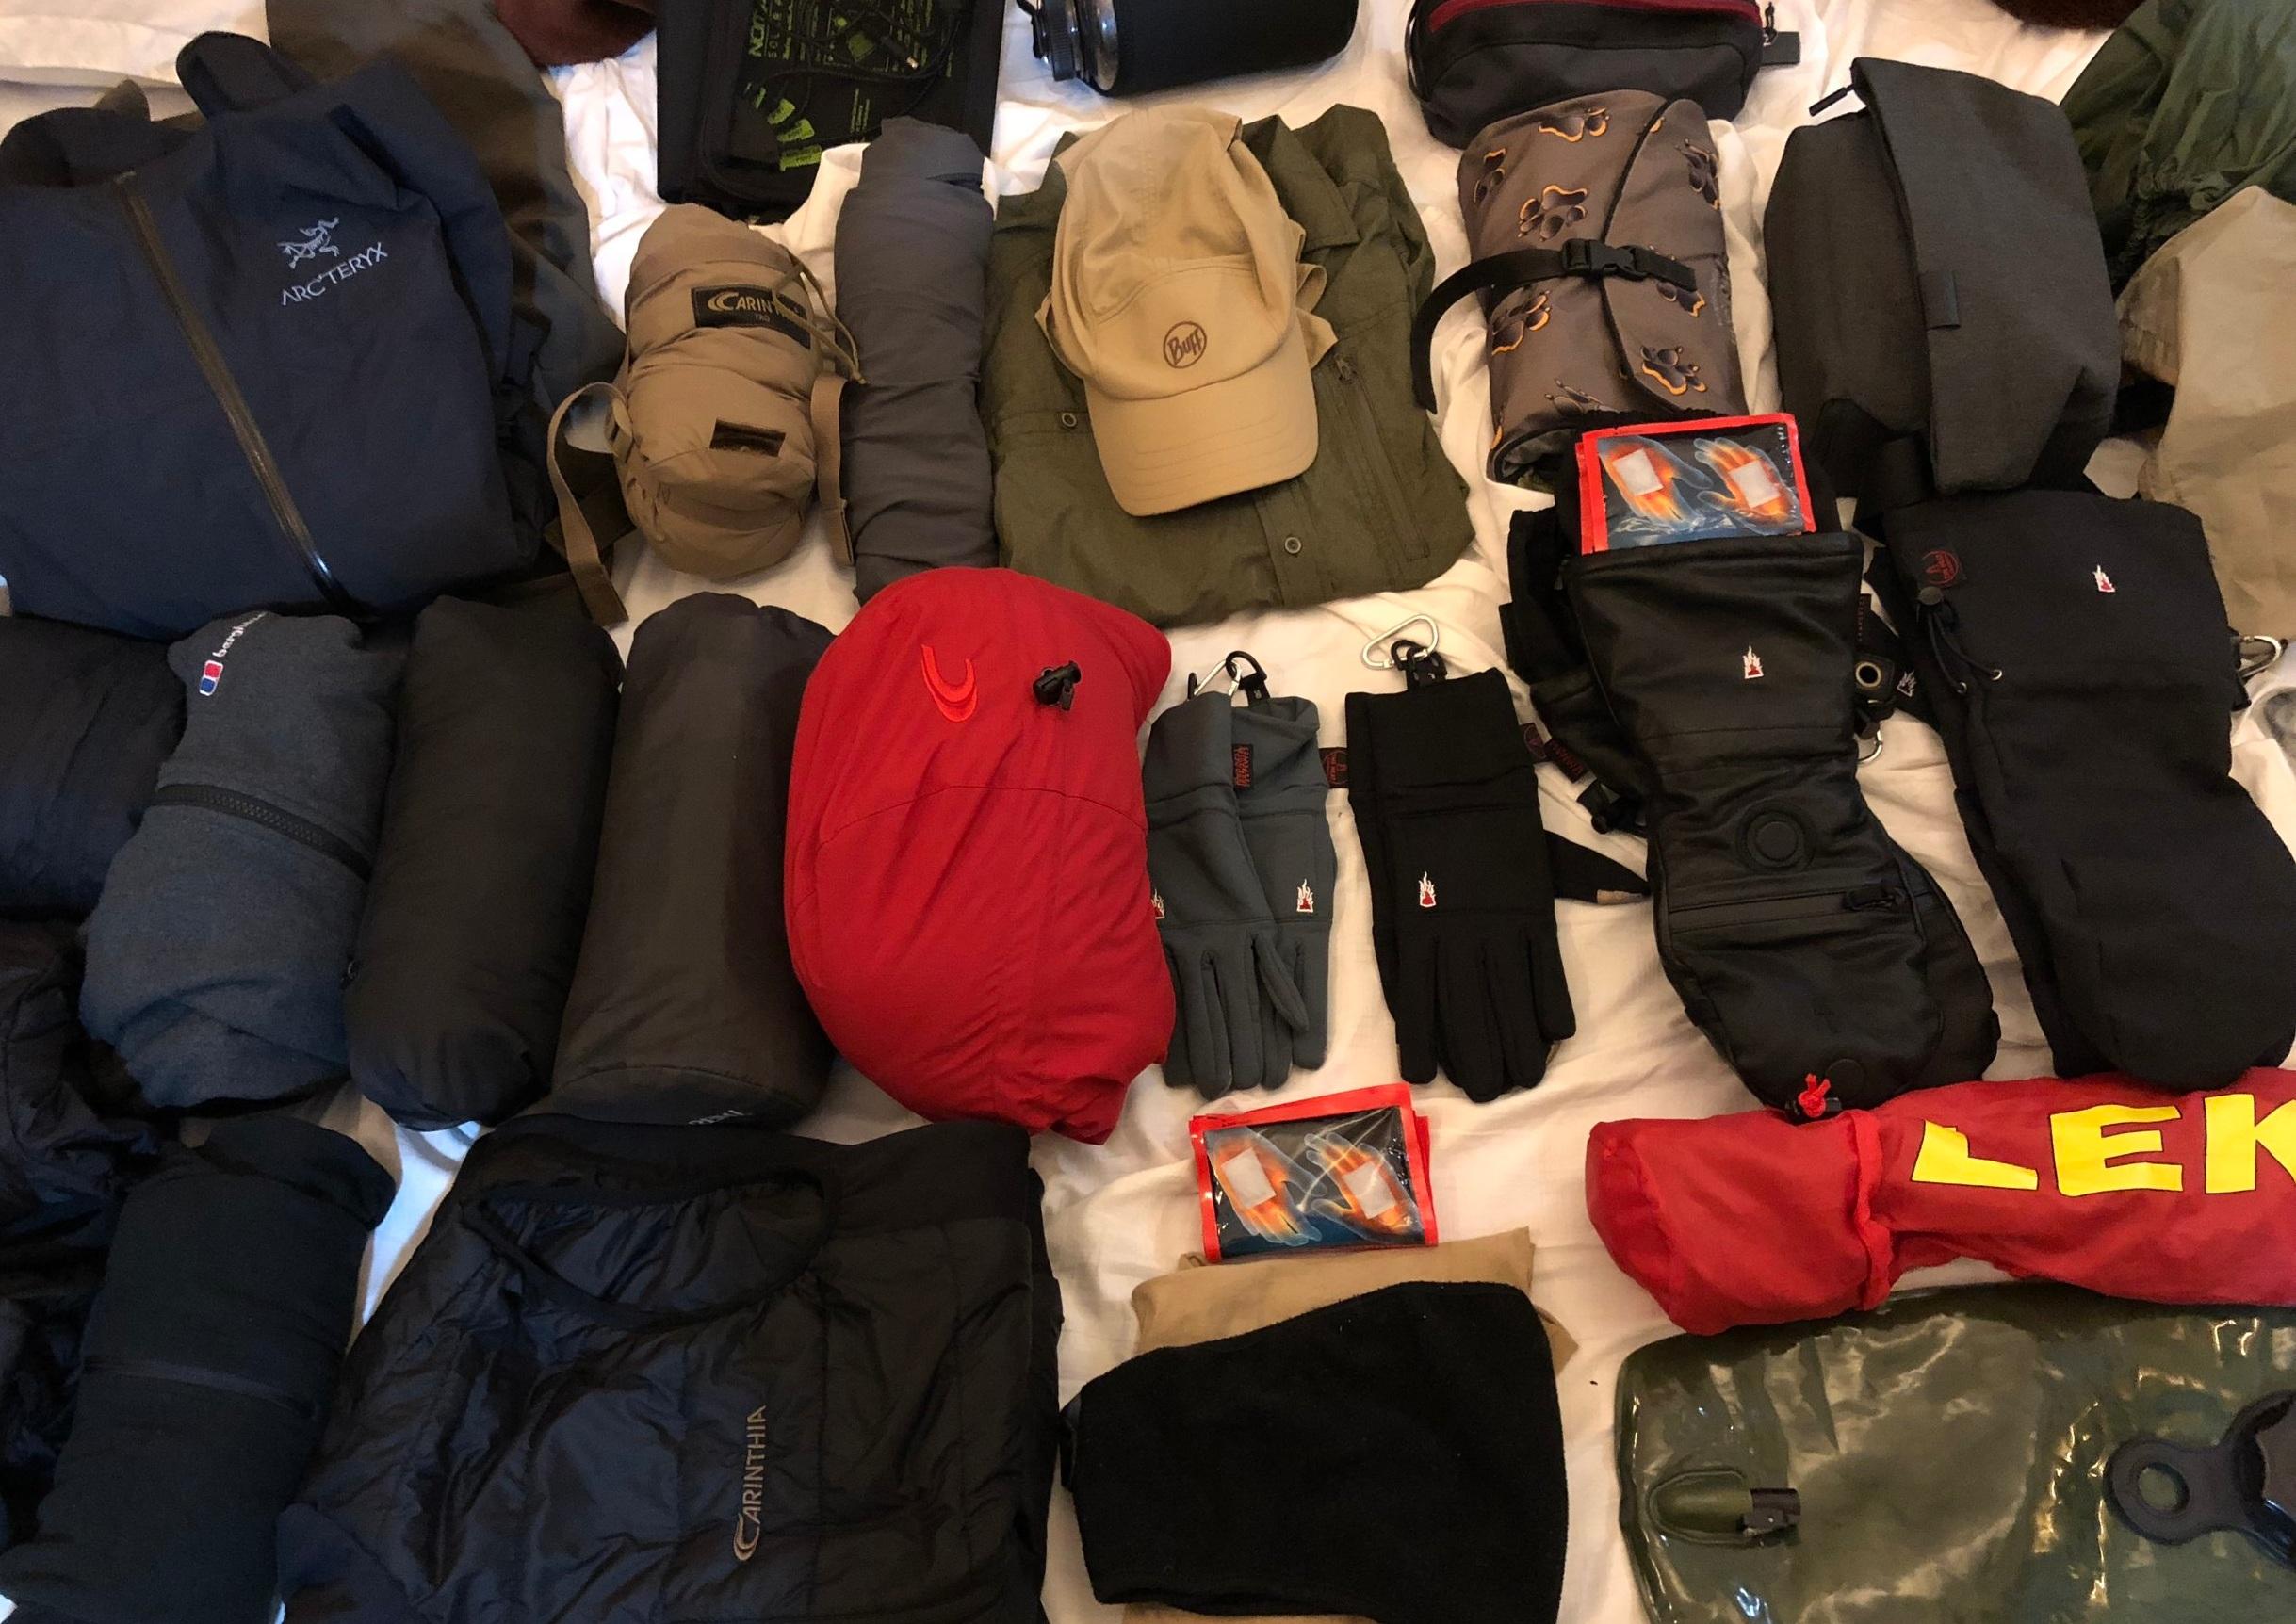 kilimanjaro daunen jacke schwarz